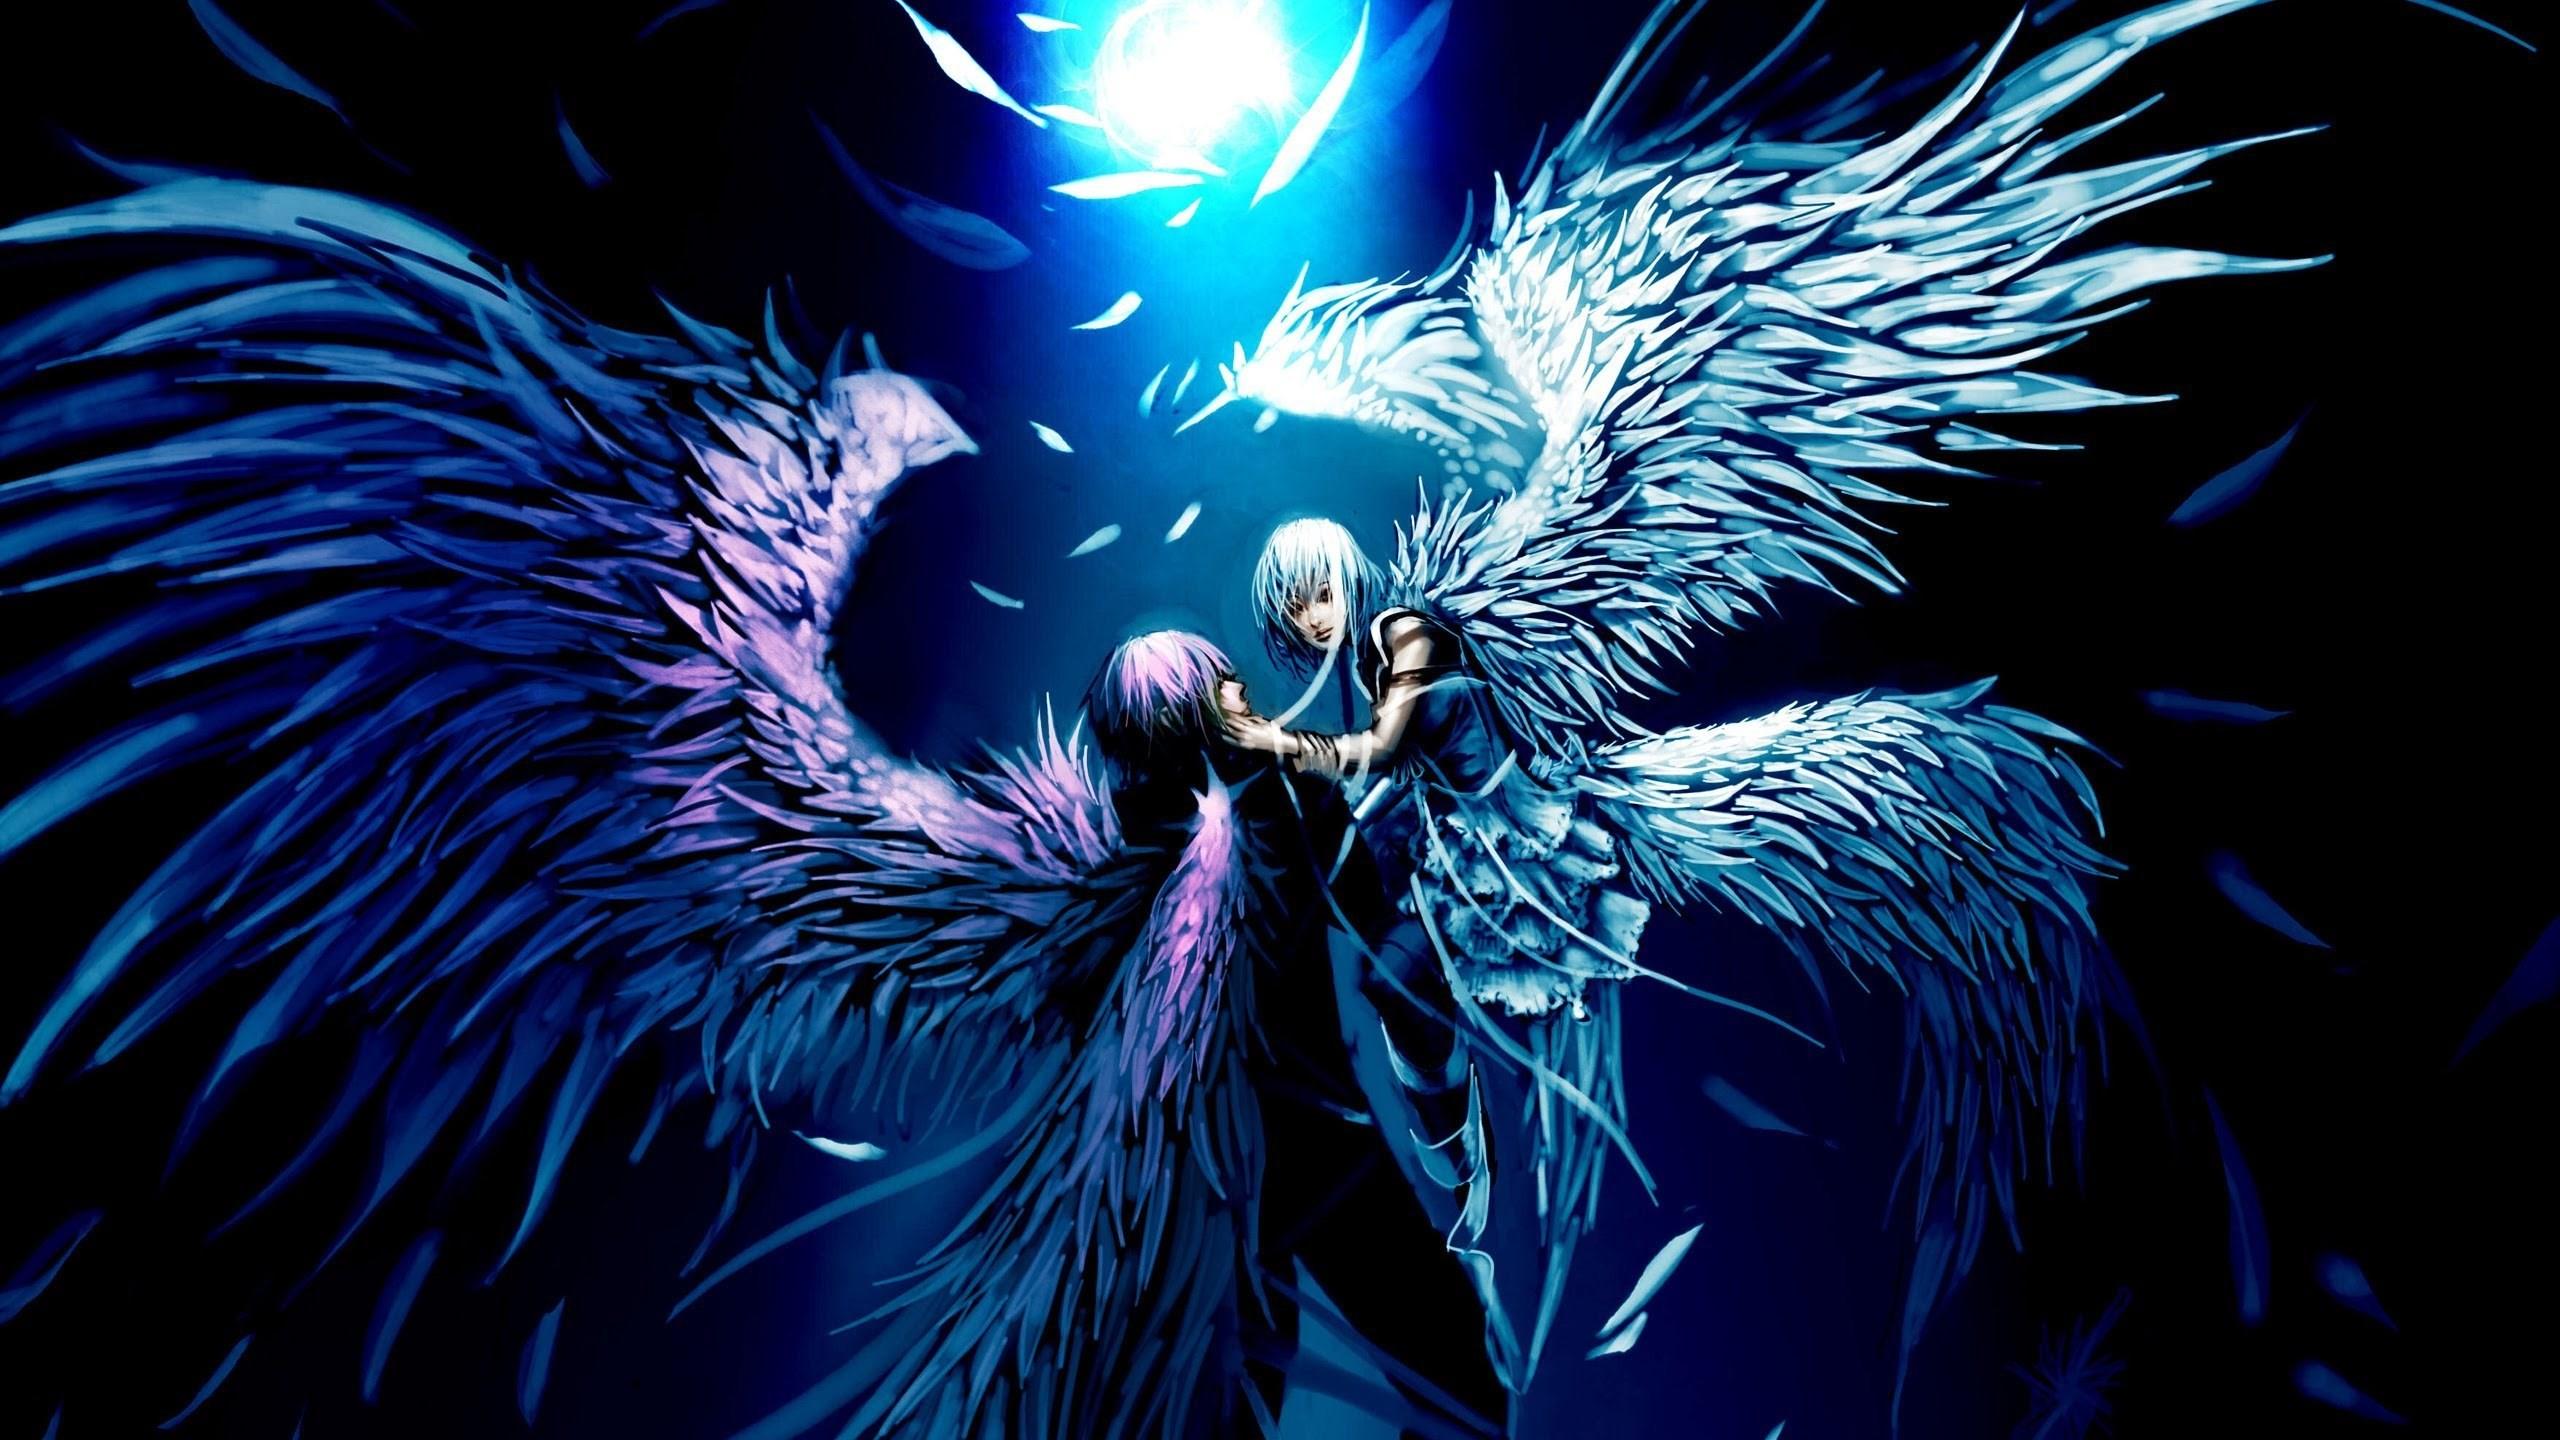 angel anime wallpapers hd